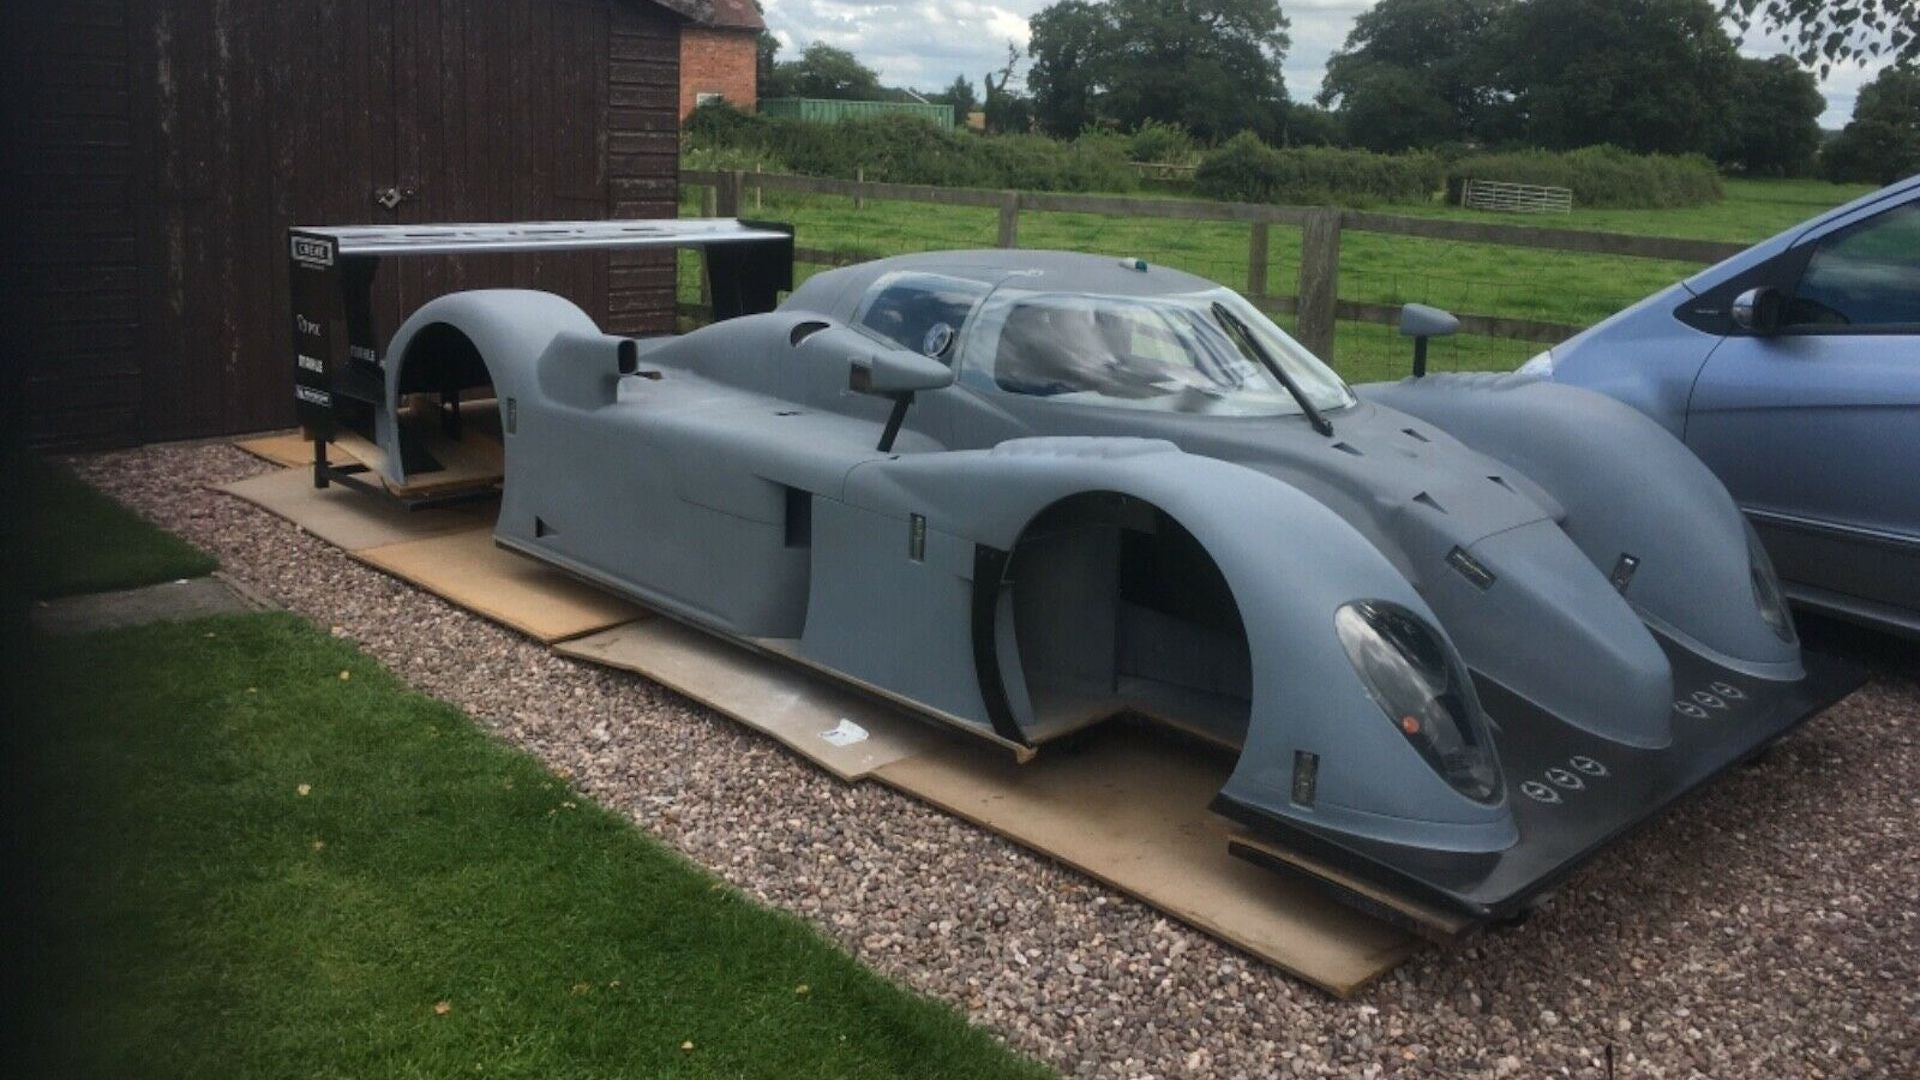 Terinspirasi Le Mans, Racing Diehard Bikin Replika Mobil Balap Bentley